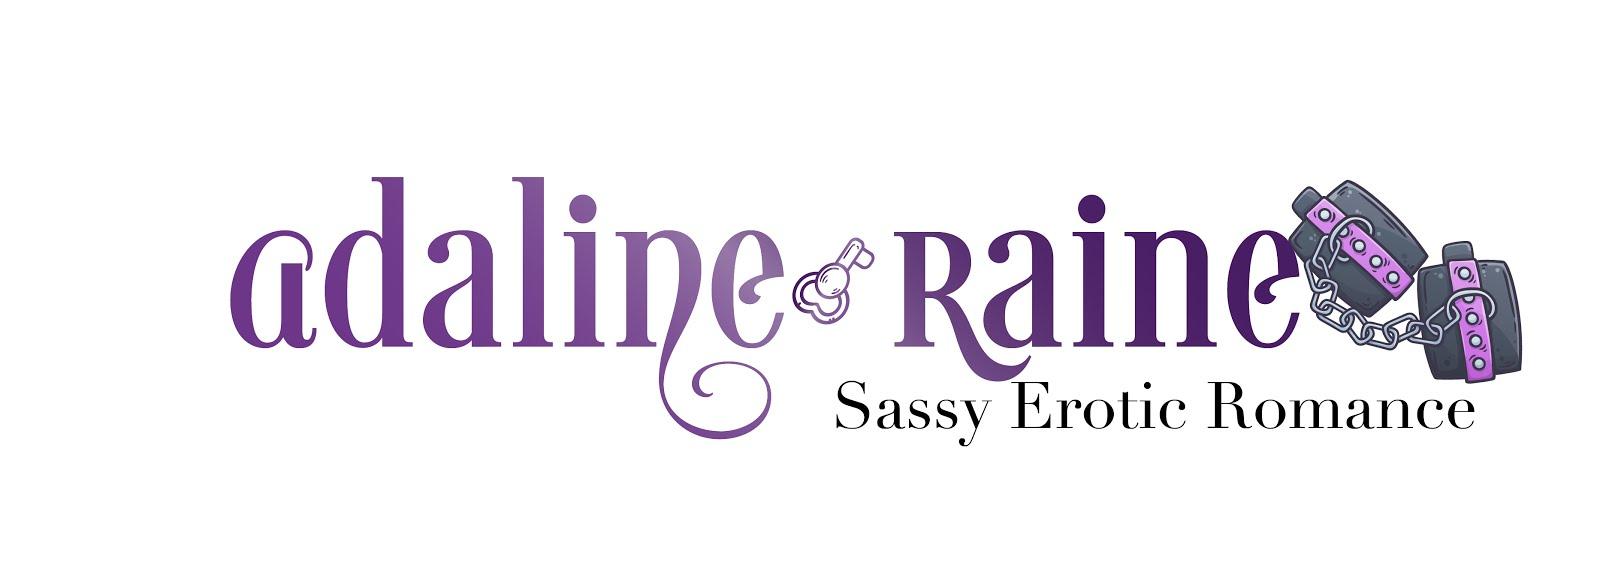 Sassy Erotic Romance